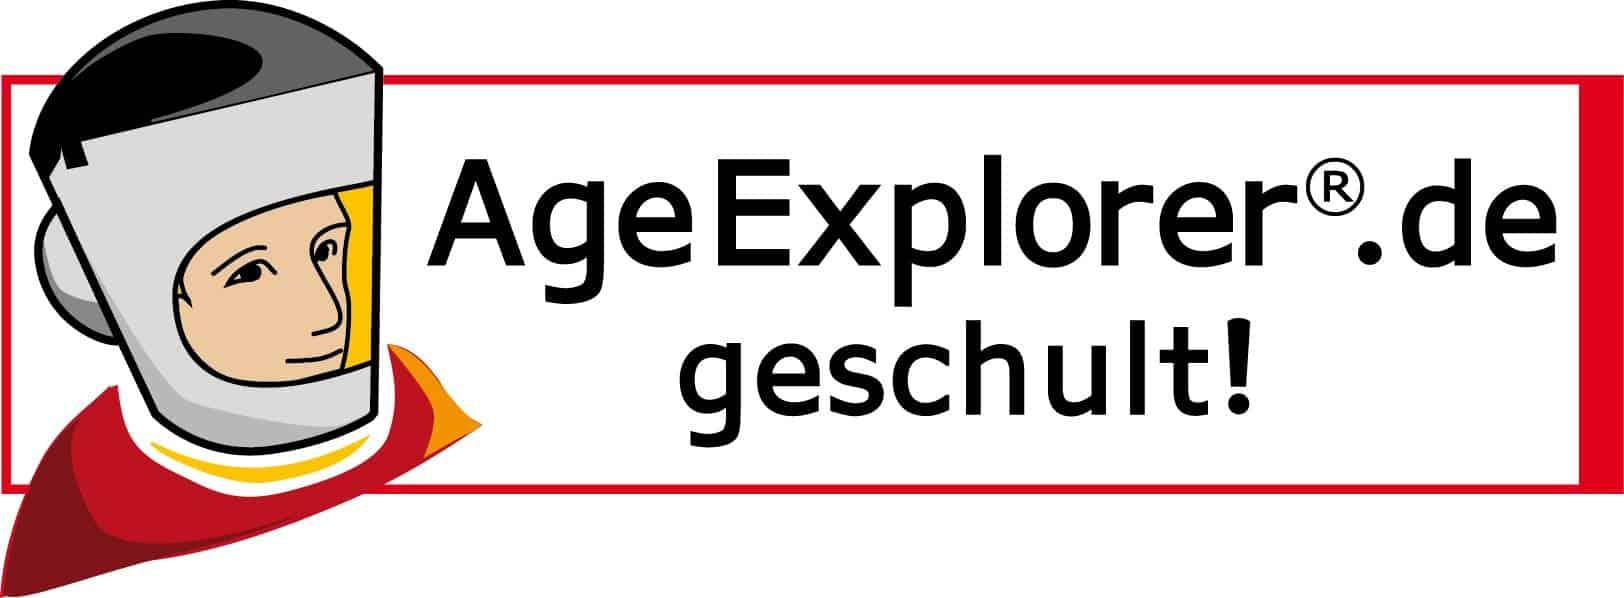 Age Explorer geschult